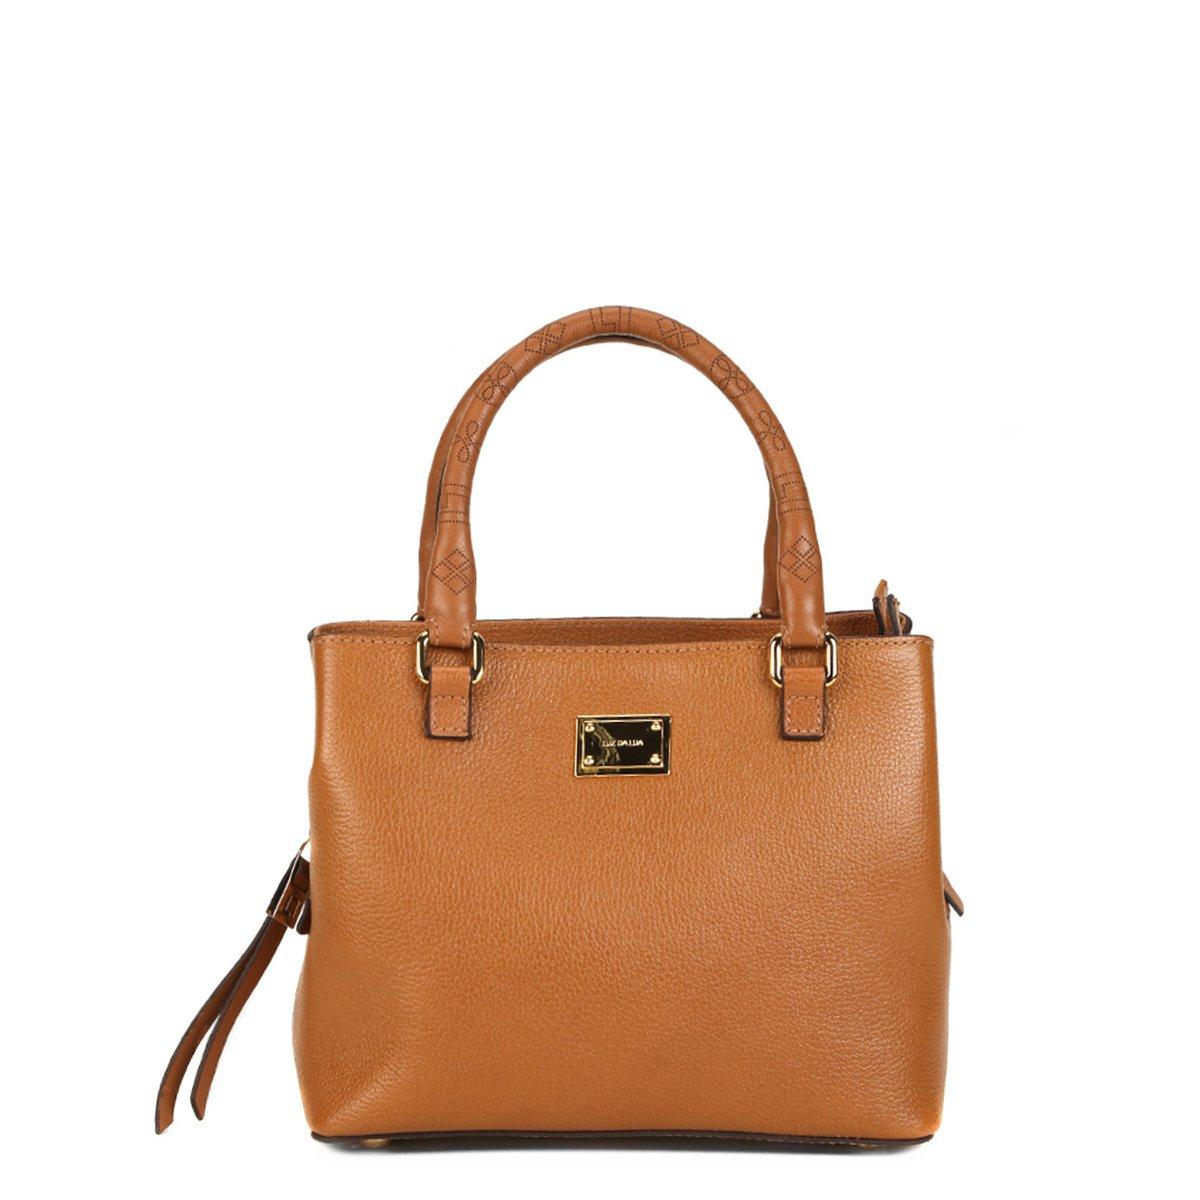 95d387a7db Bolsa Couro Luz da Lua Mini Bag Monograma Feminina - Compre Agora ...